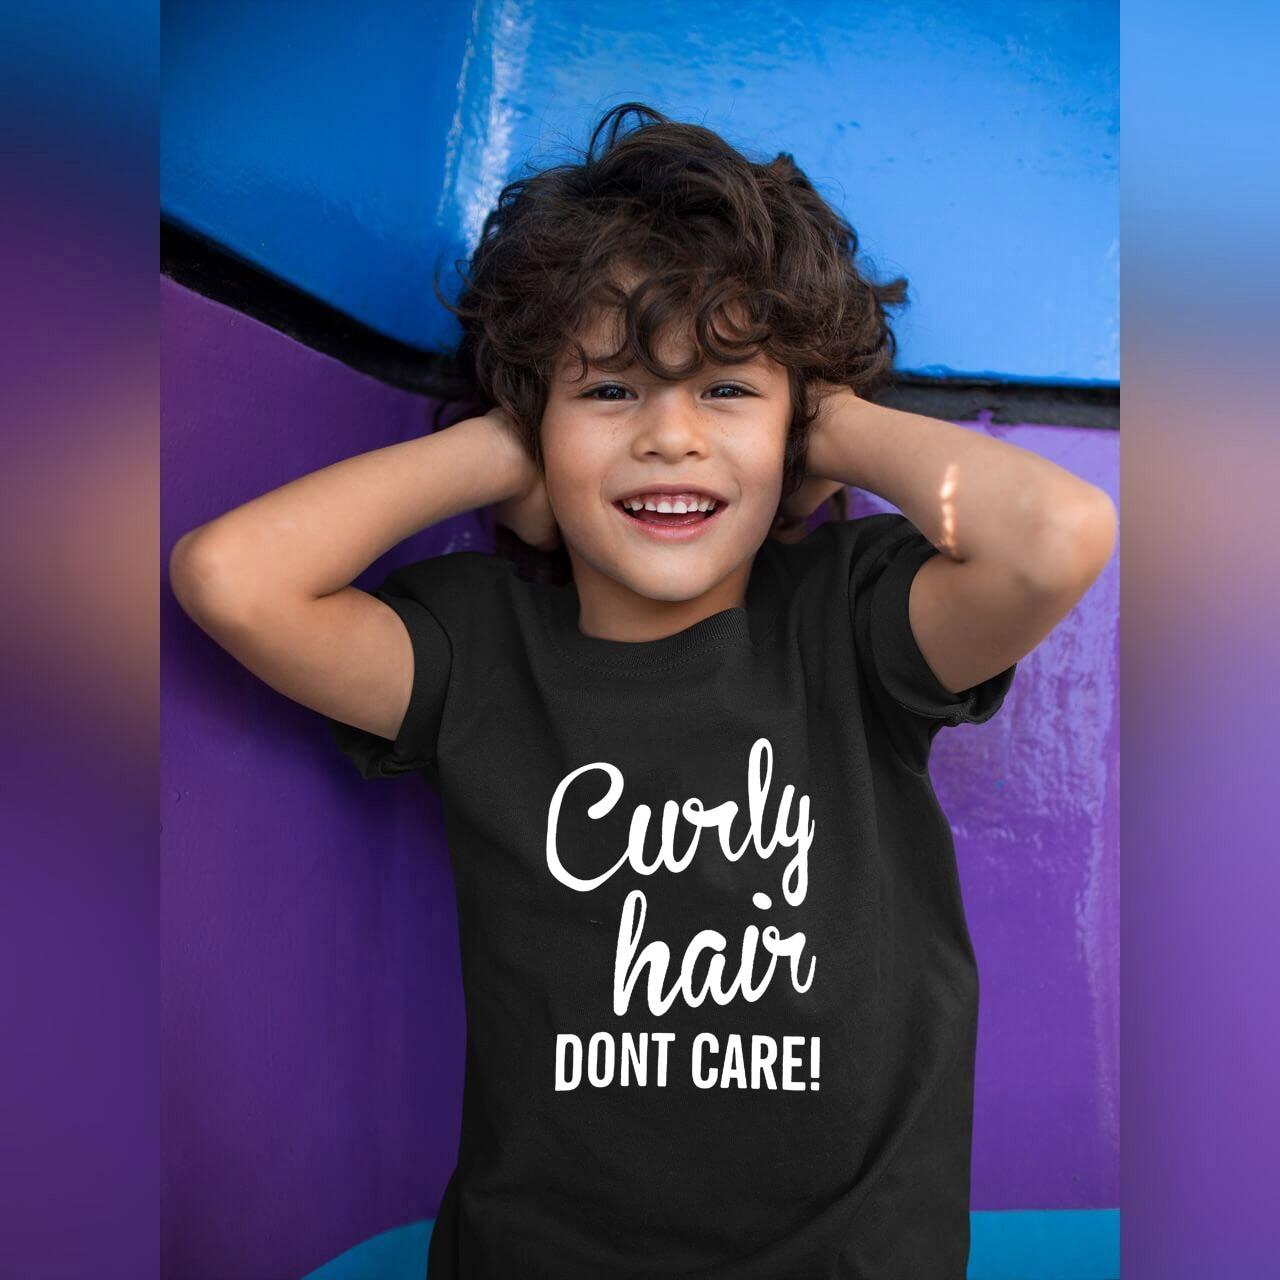 Kid Funny Shirt Curly Hair Don't Care Toddler Kids Girl Boys Print Tshirt Casual Children Short Sleeve T Shirt Streetwear